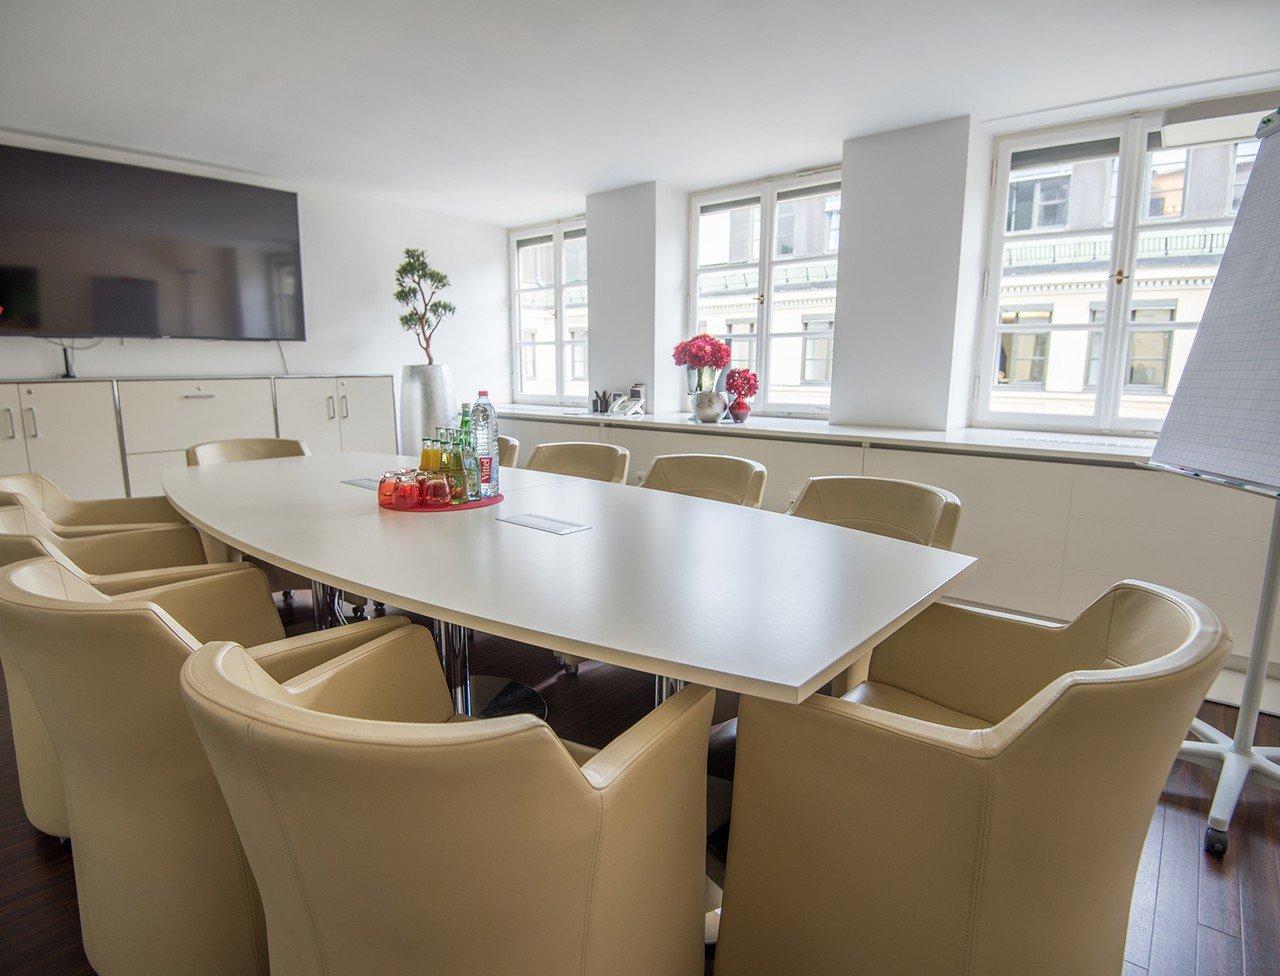 Munich Besprechungsräume Meeting room Satellite Office - Ludwigpalais 1 image 3